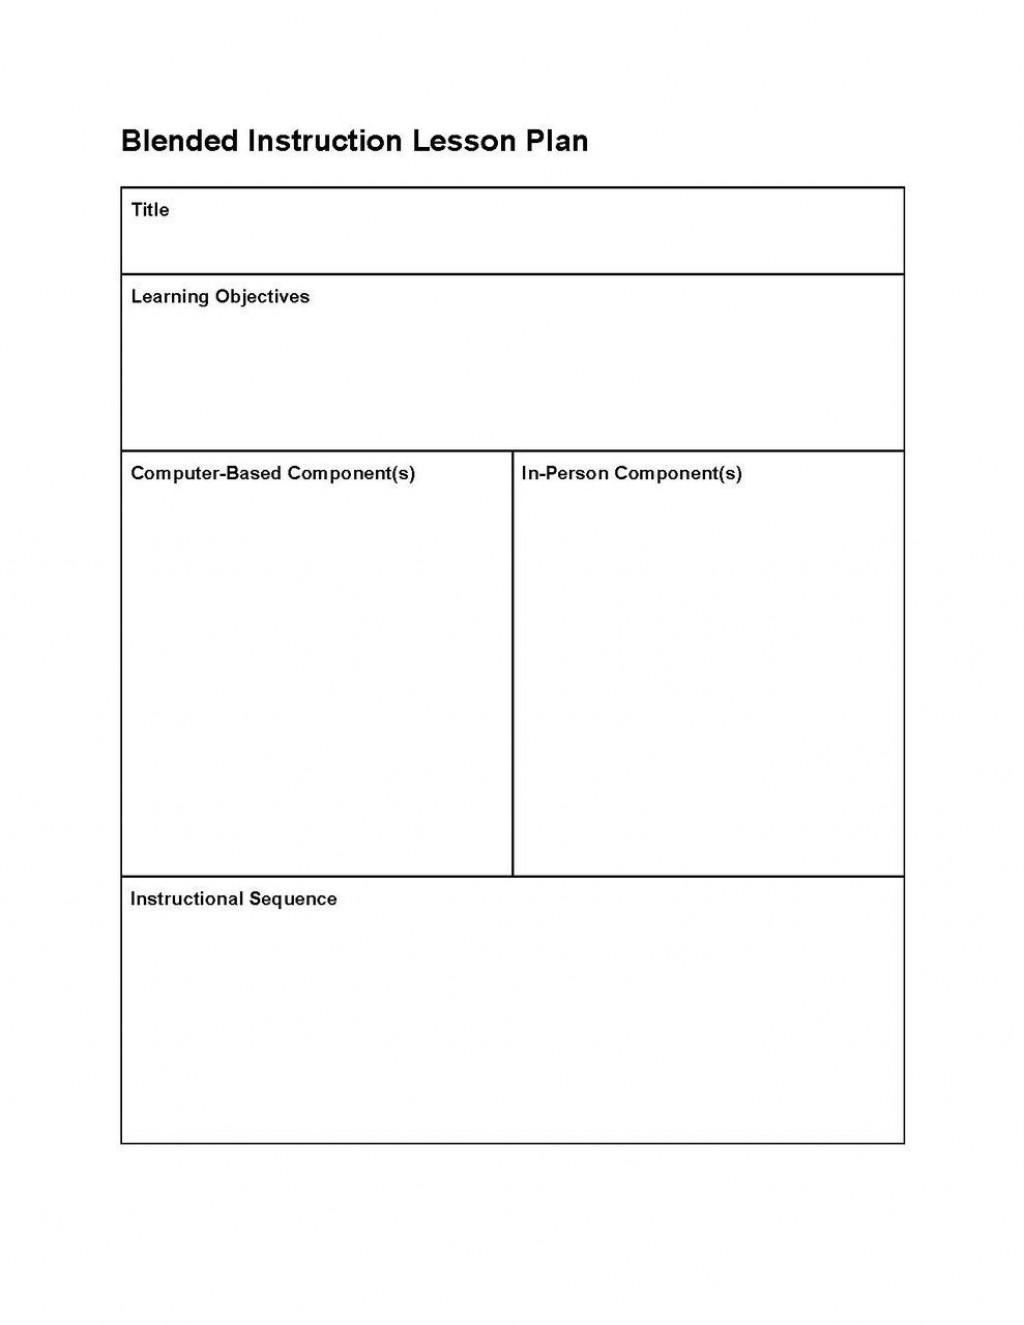 000 Fascinating Editable Lesson Plan Template Idea  Templates For Preschool Word FreeLarge